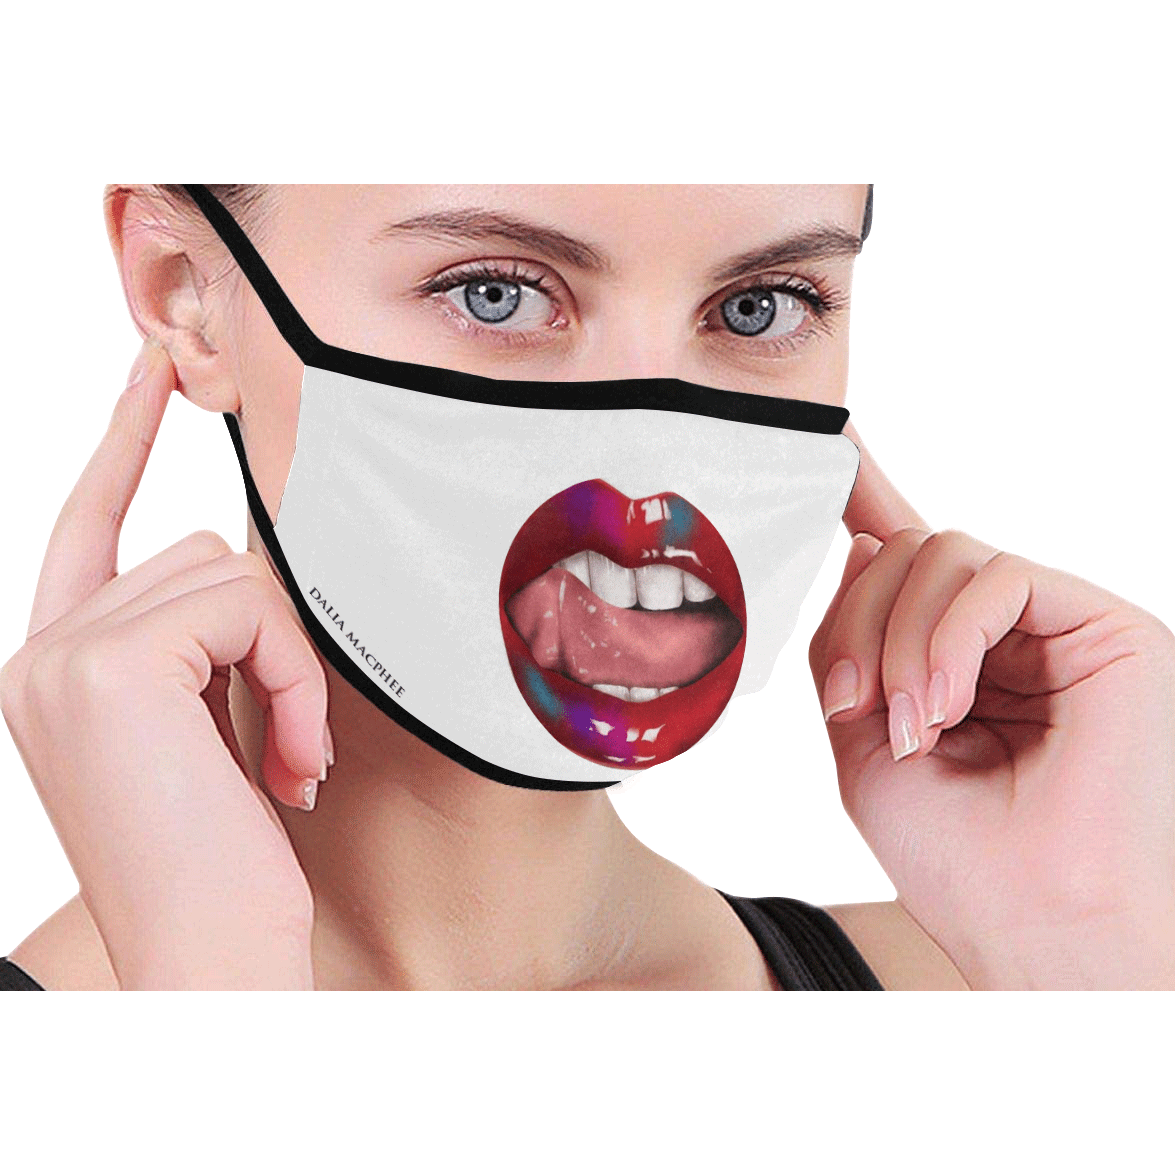 Dalia McPhee Masks, $19-21 @daliaonline.com